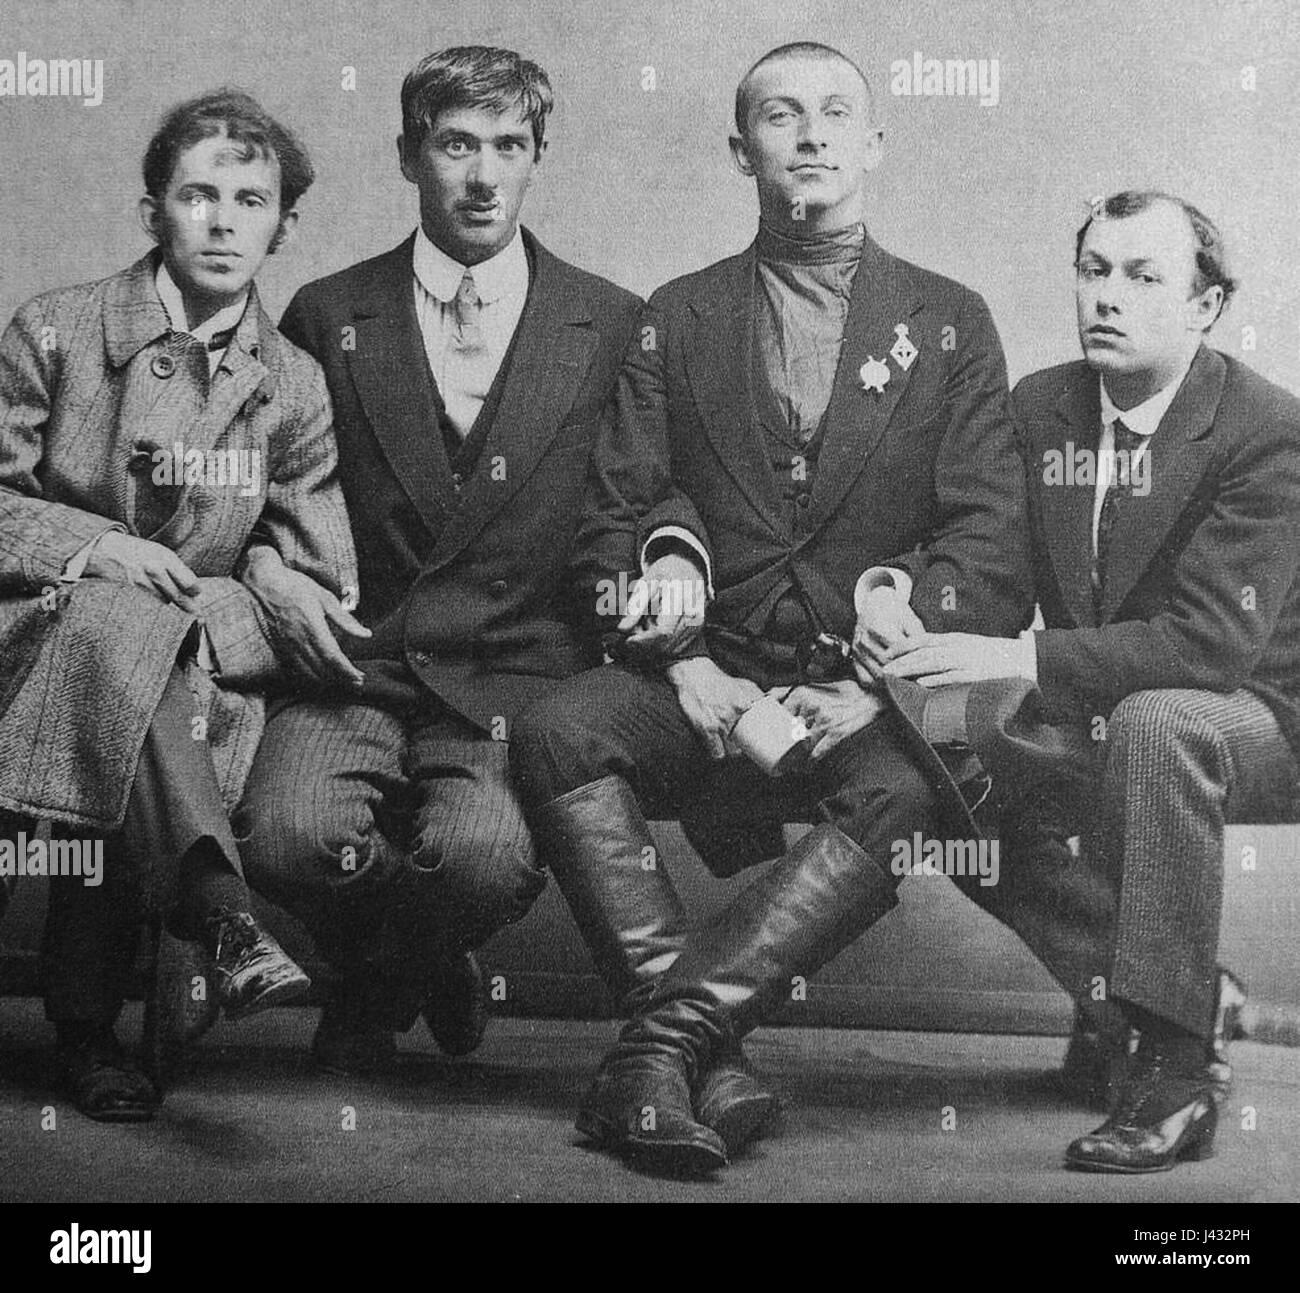 Mandelstam, Cukovsky, Livshiz & Annenkov 1914 Karl Bulla - Stock Image